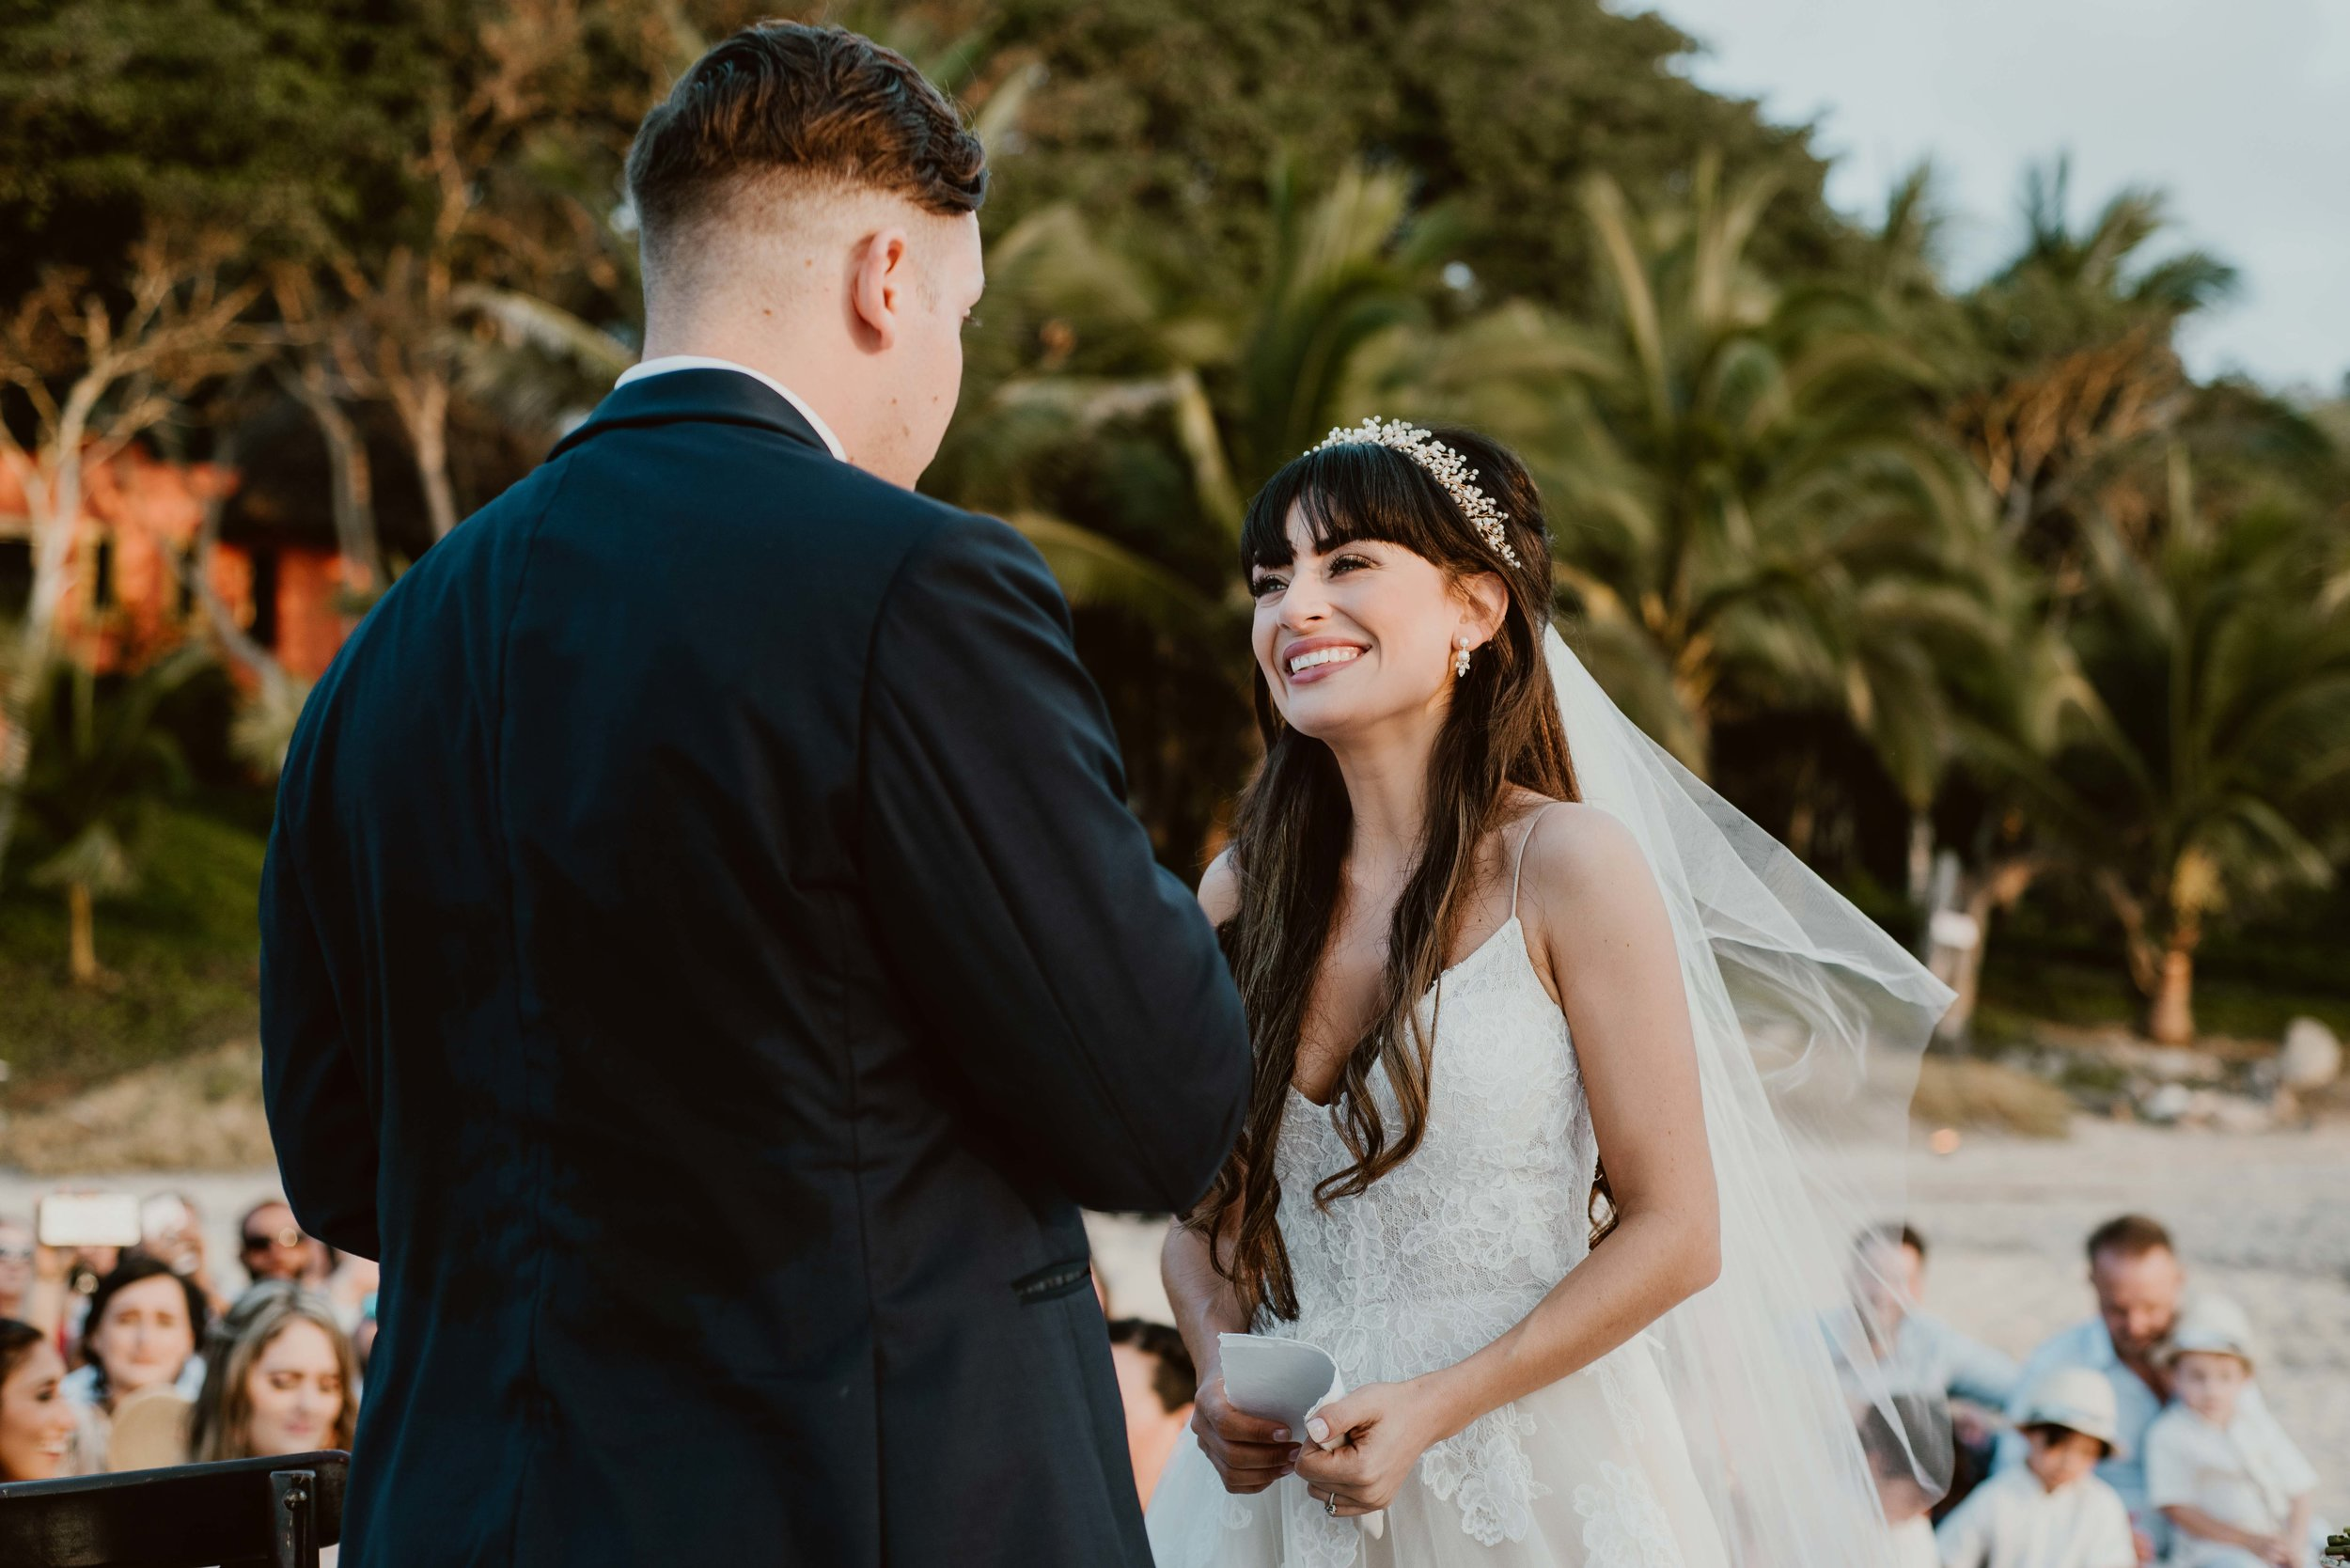 Mariana+Blake Sayulita Wedding-332.jpg